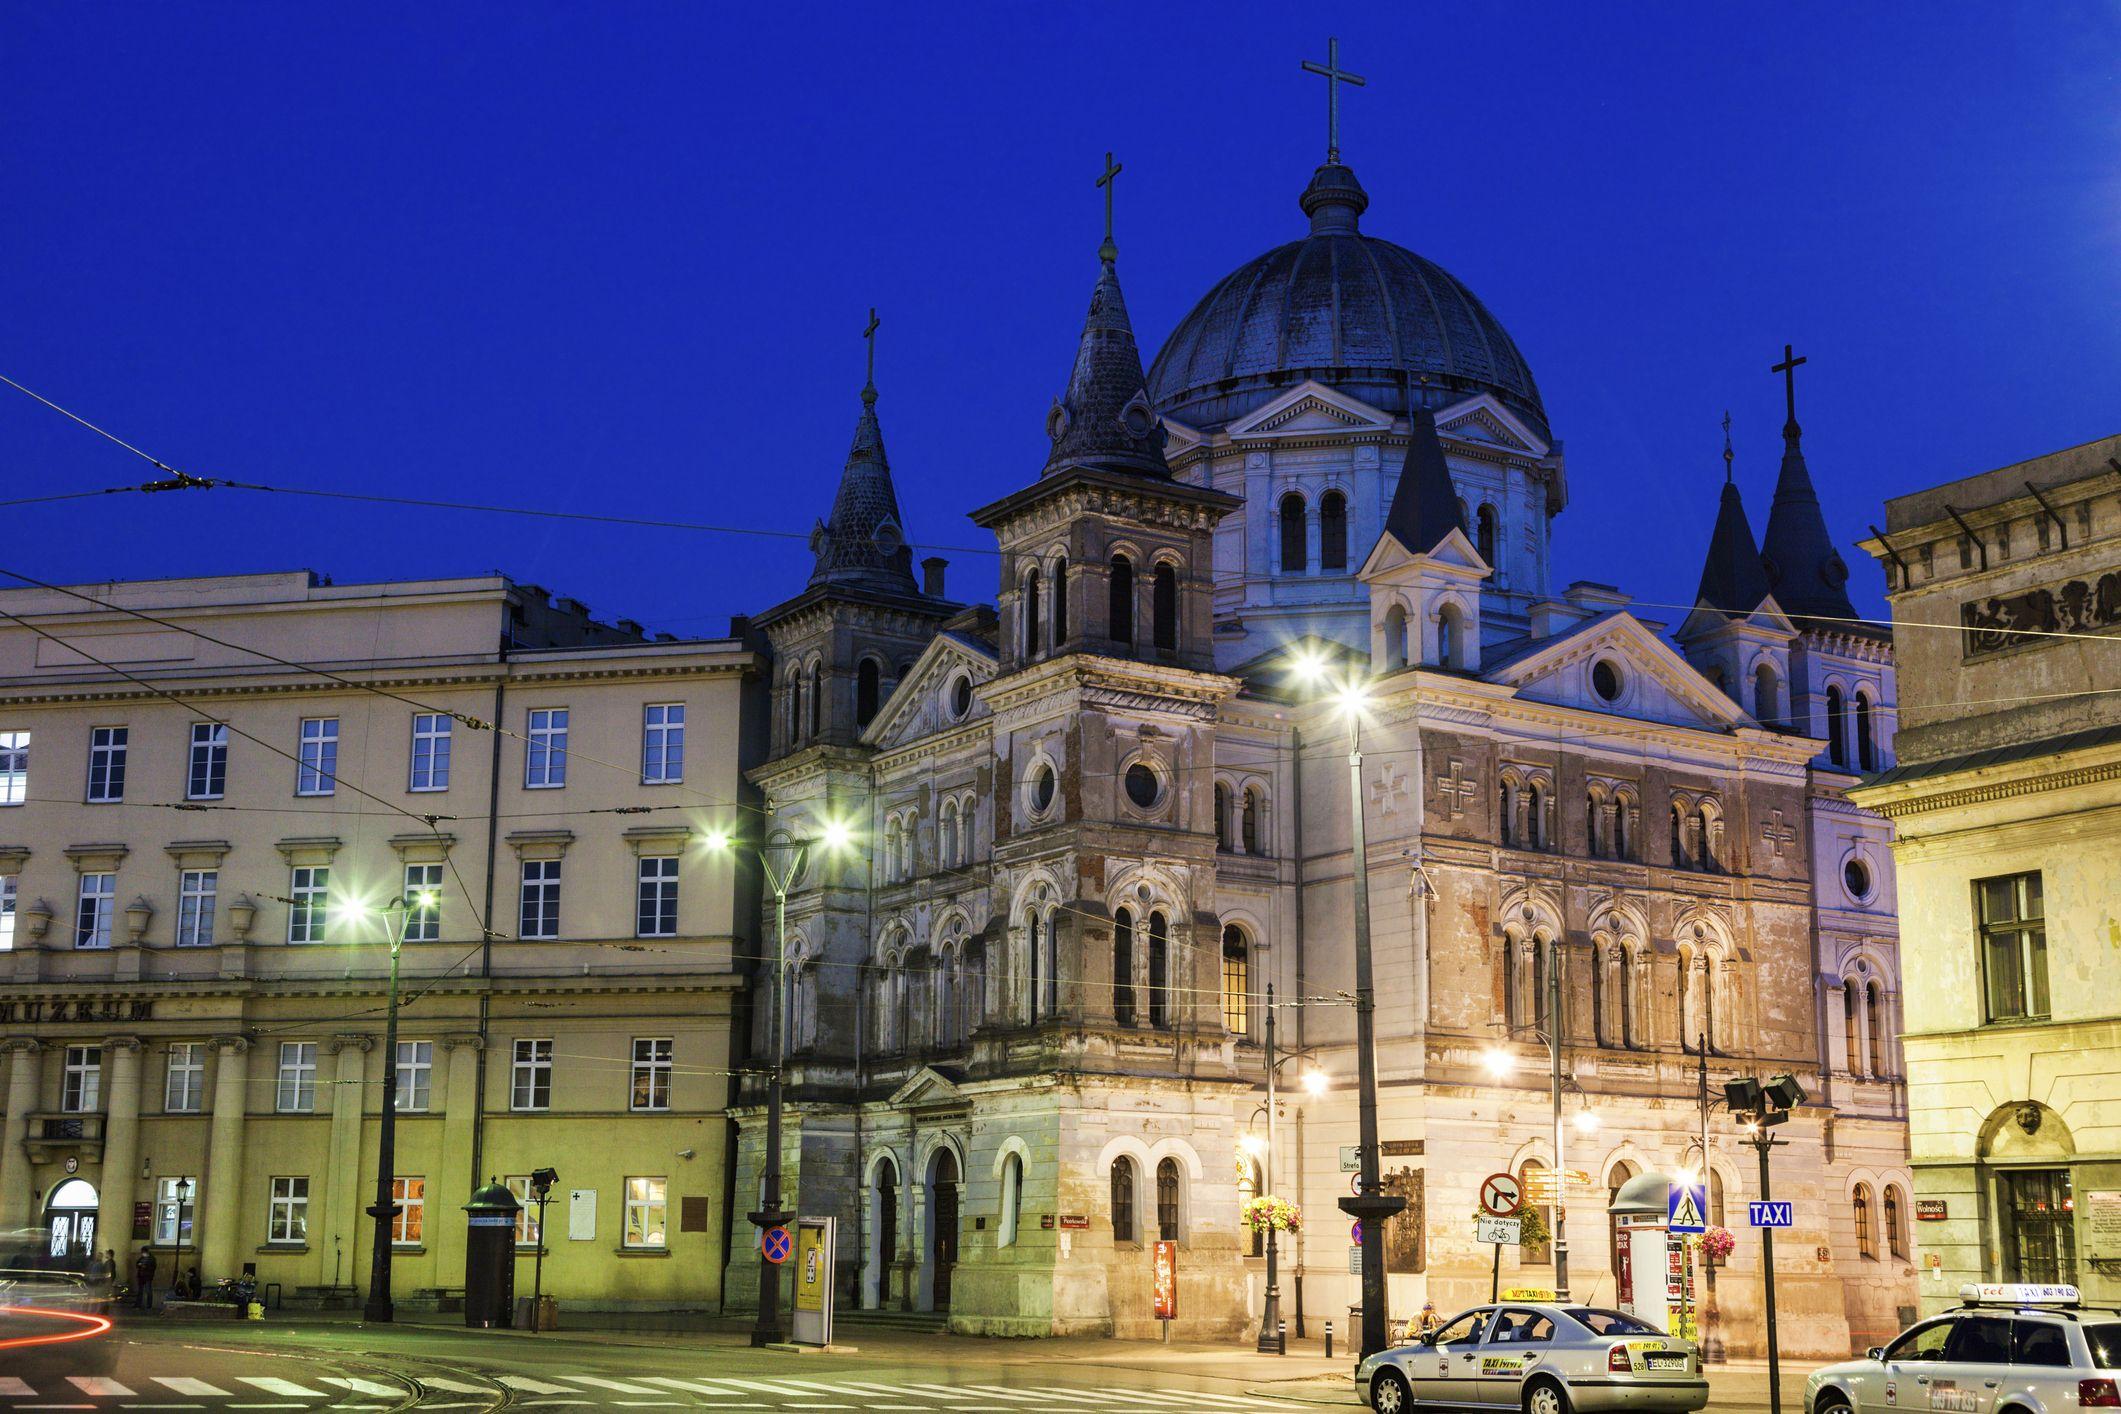 Church Pentecost on Liberty Square in Lodz, Poland